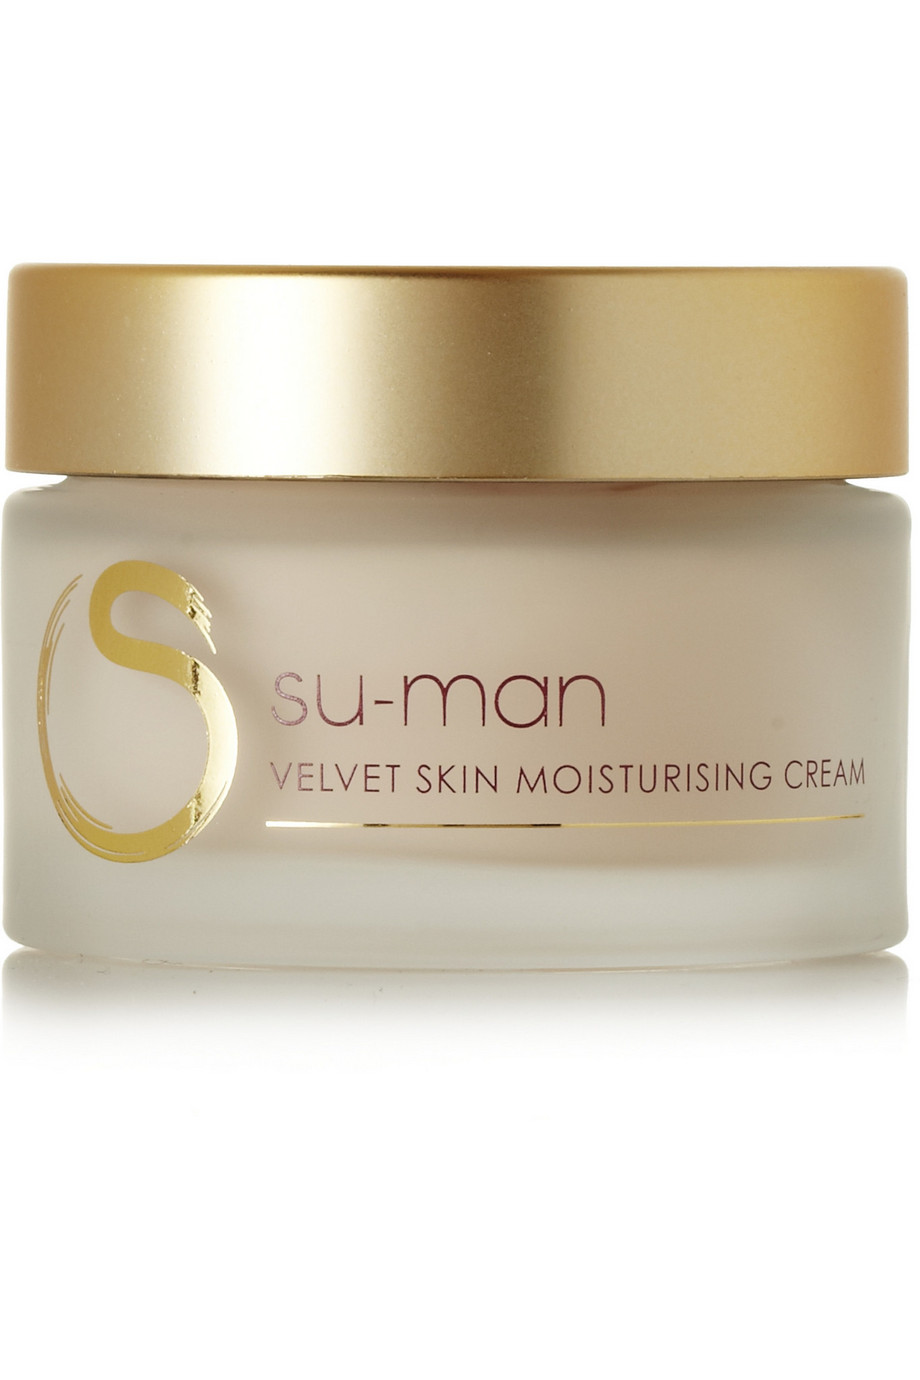 Velvet Skin Moisturising Cream, 50ml, by Su-Man Skincare